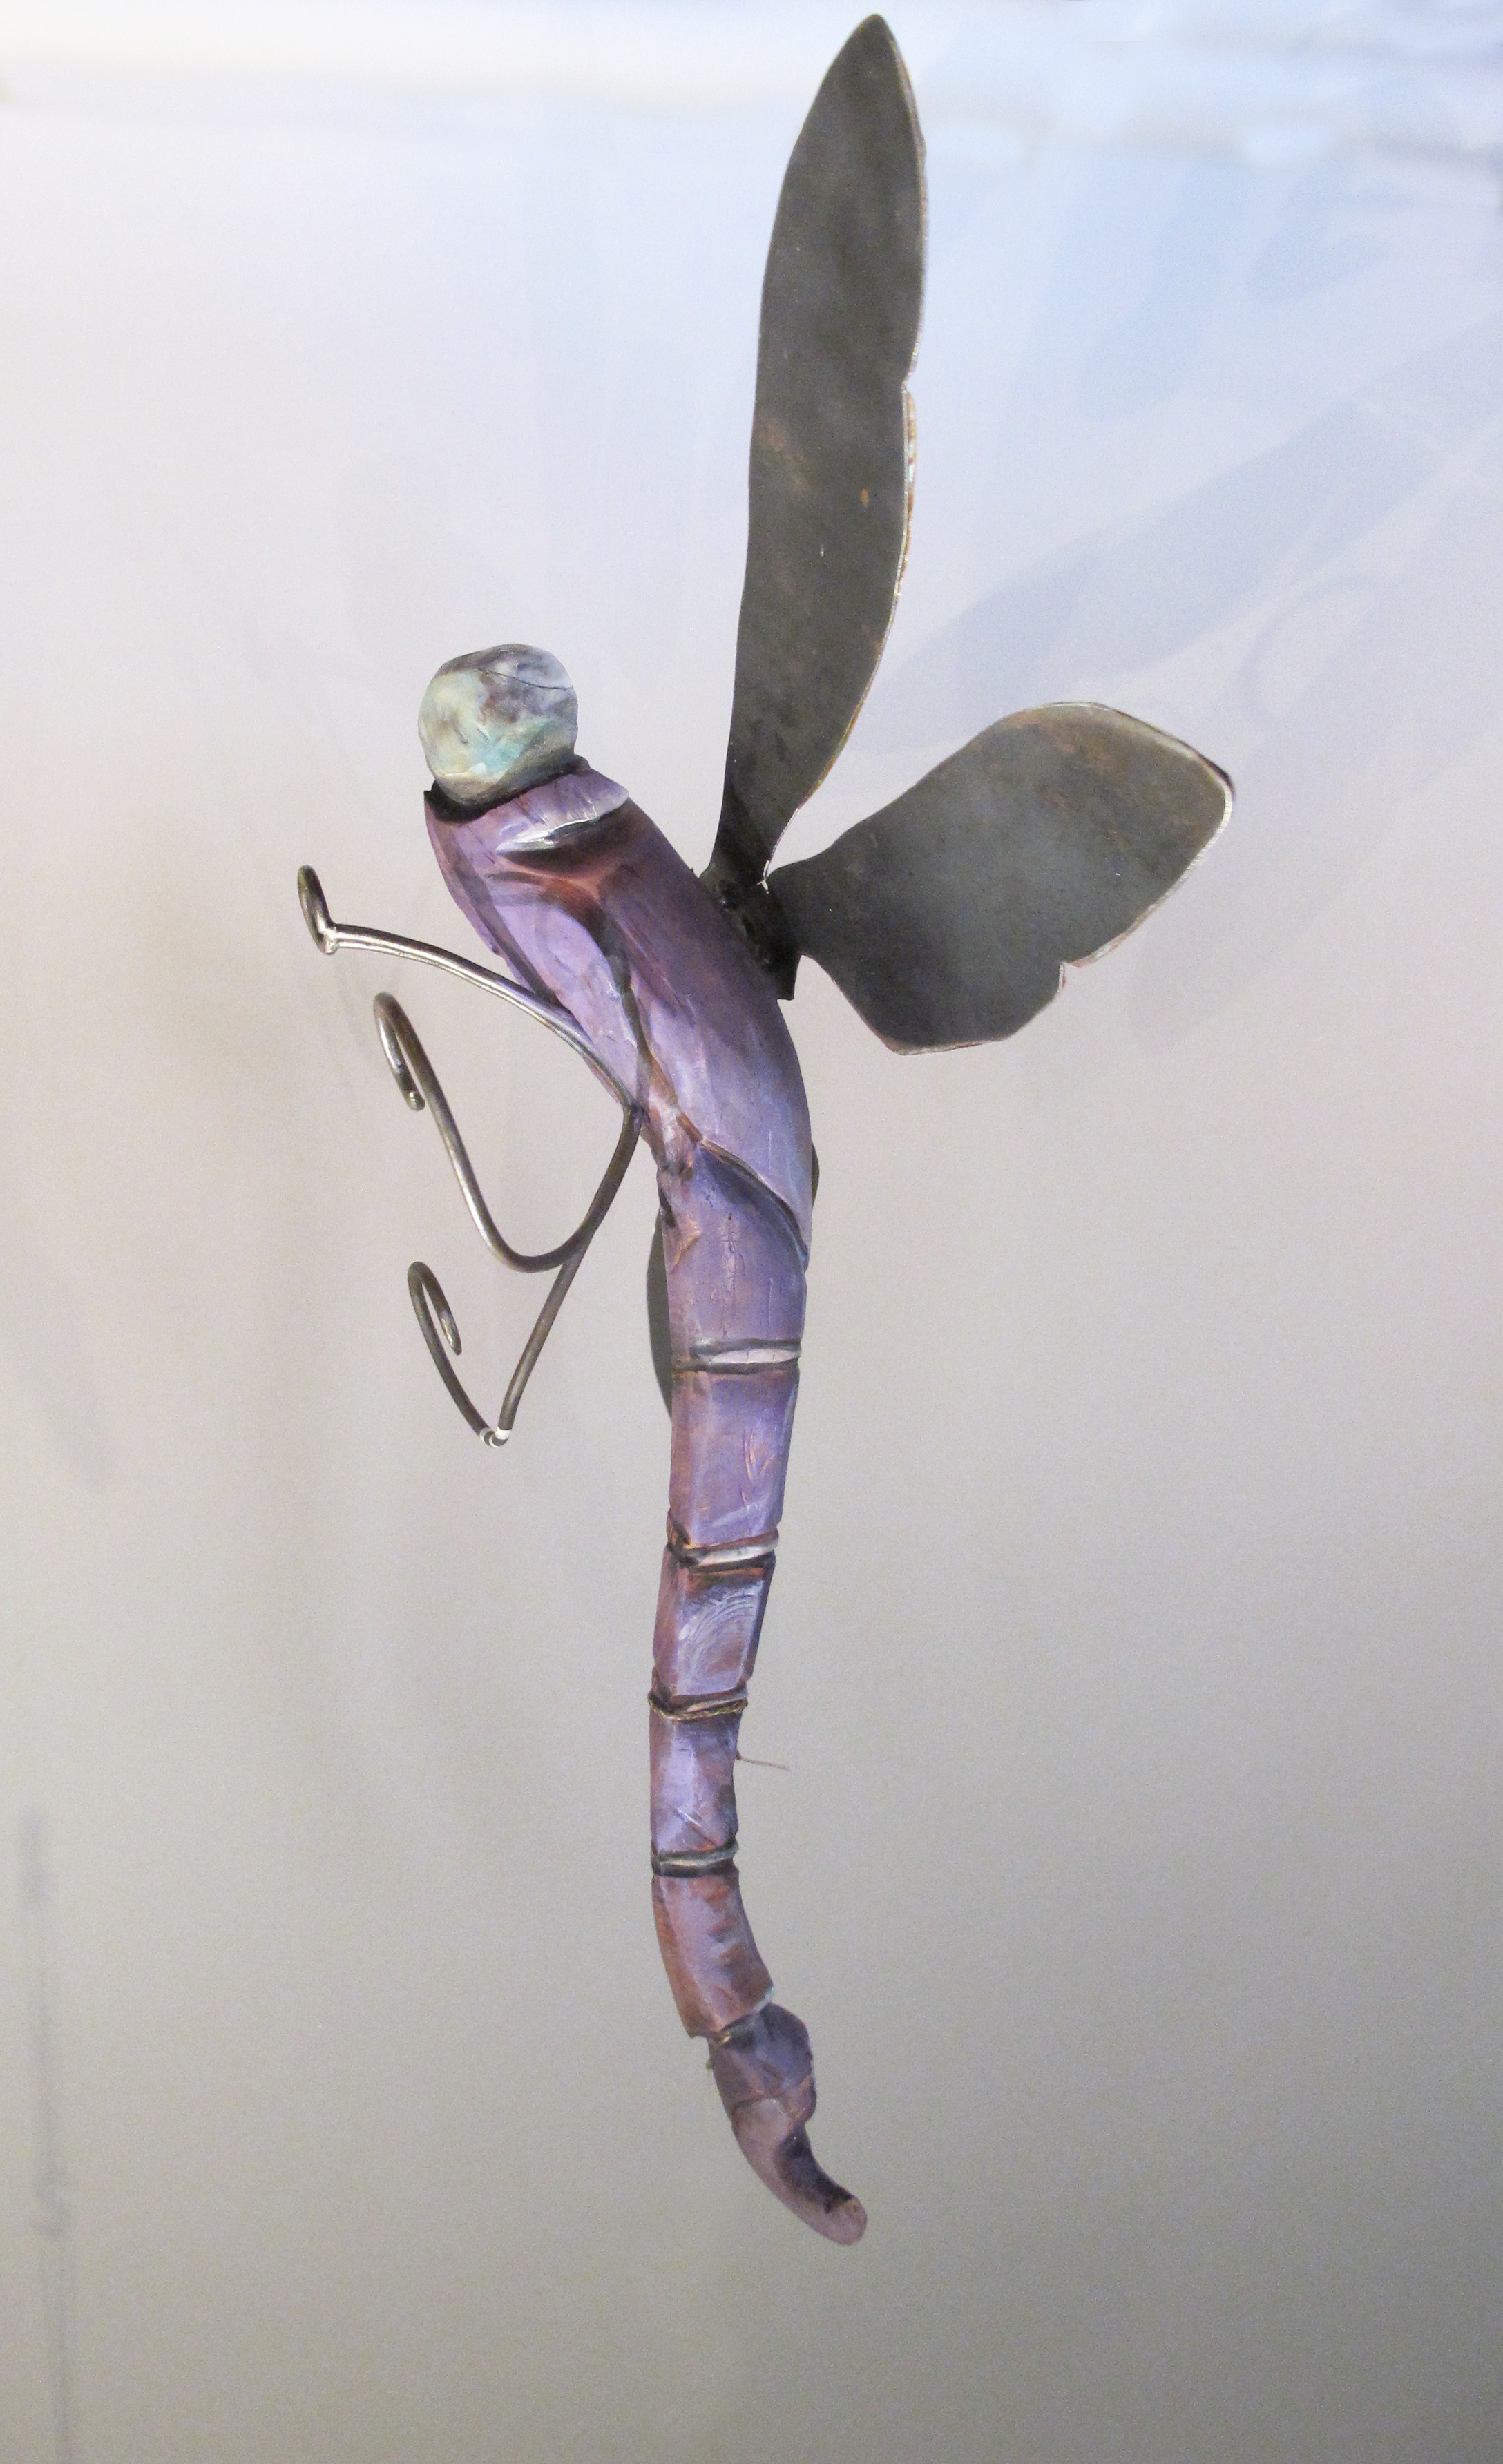 purpledragonfly2017-03.jpg